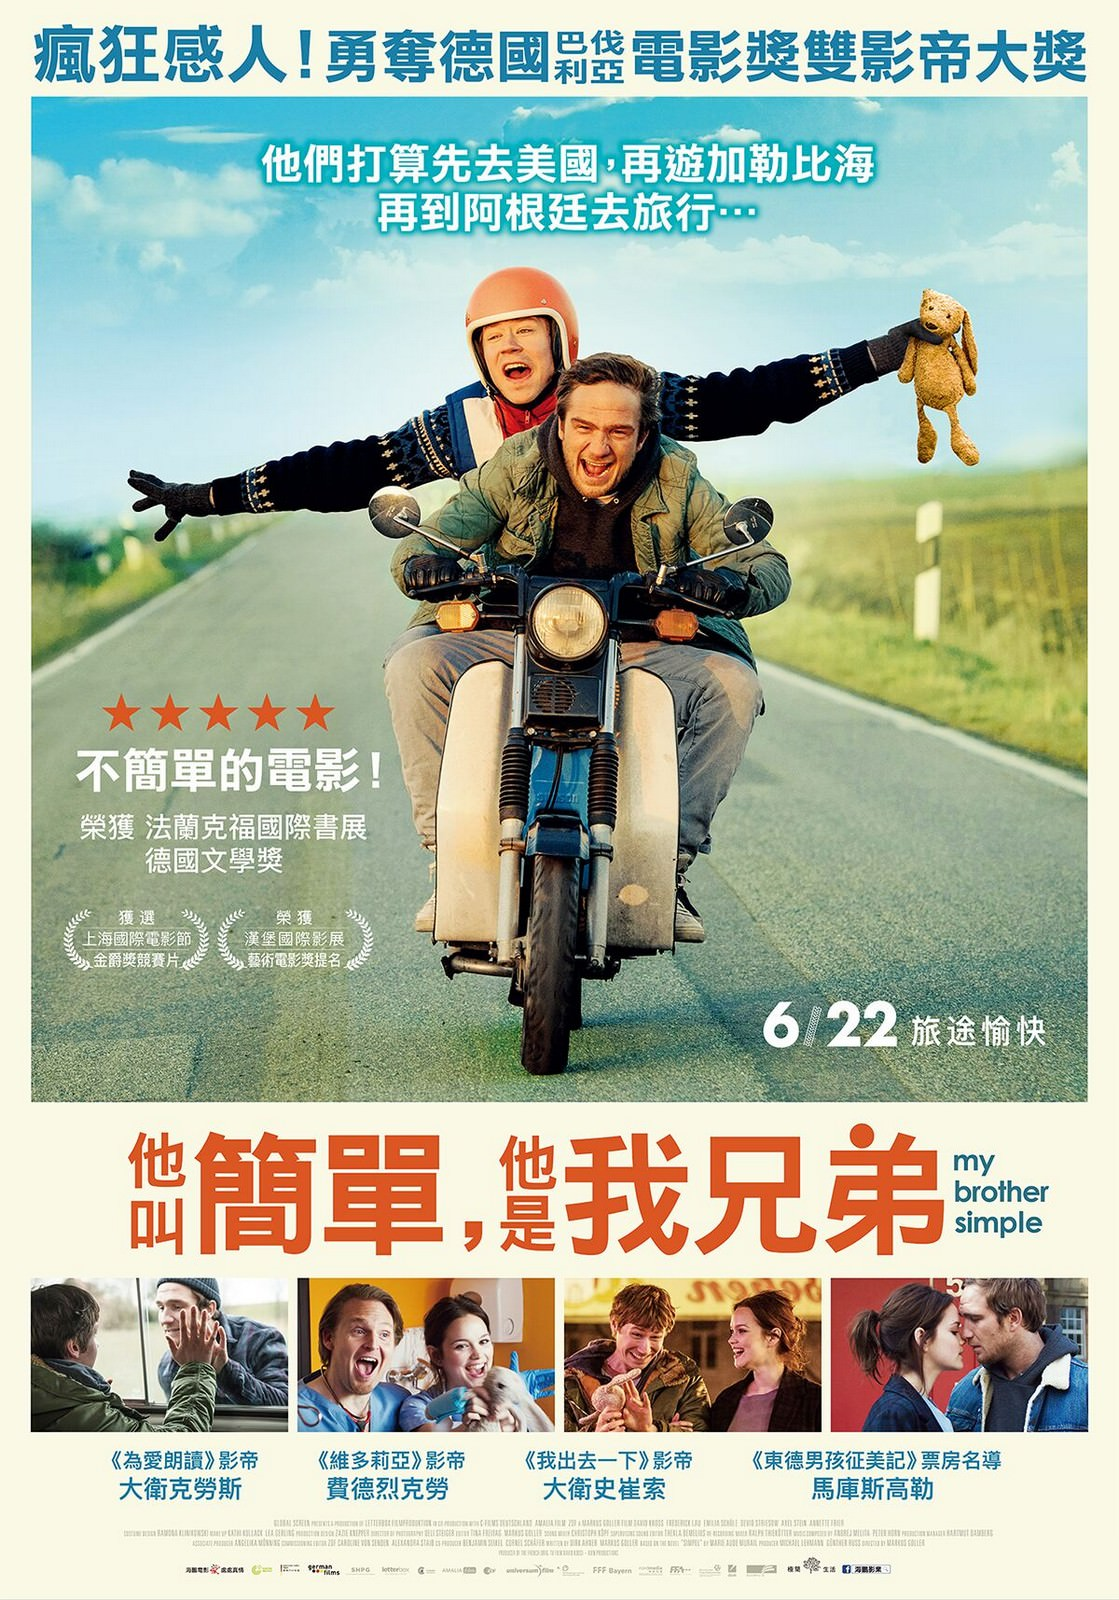 Movie, Simpel(德國, 2017) / 他叫簡單,他是我兄弟(台) / My Brother Simple(英文) / 我单纯的兄弟(網), 電影海報, 台灣